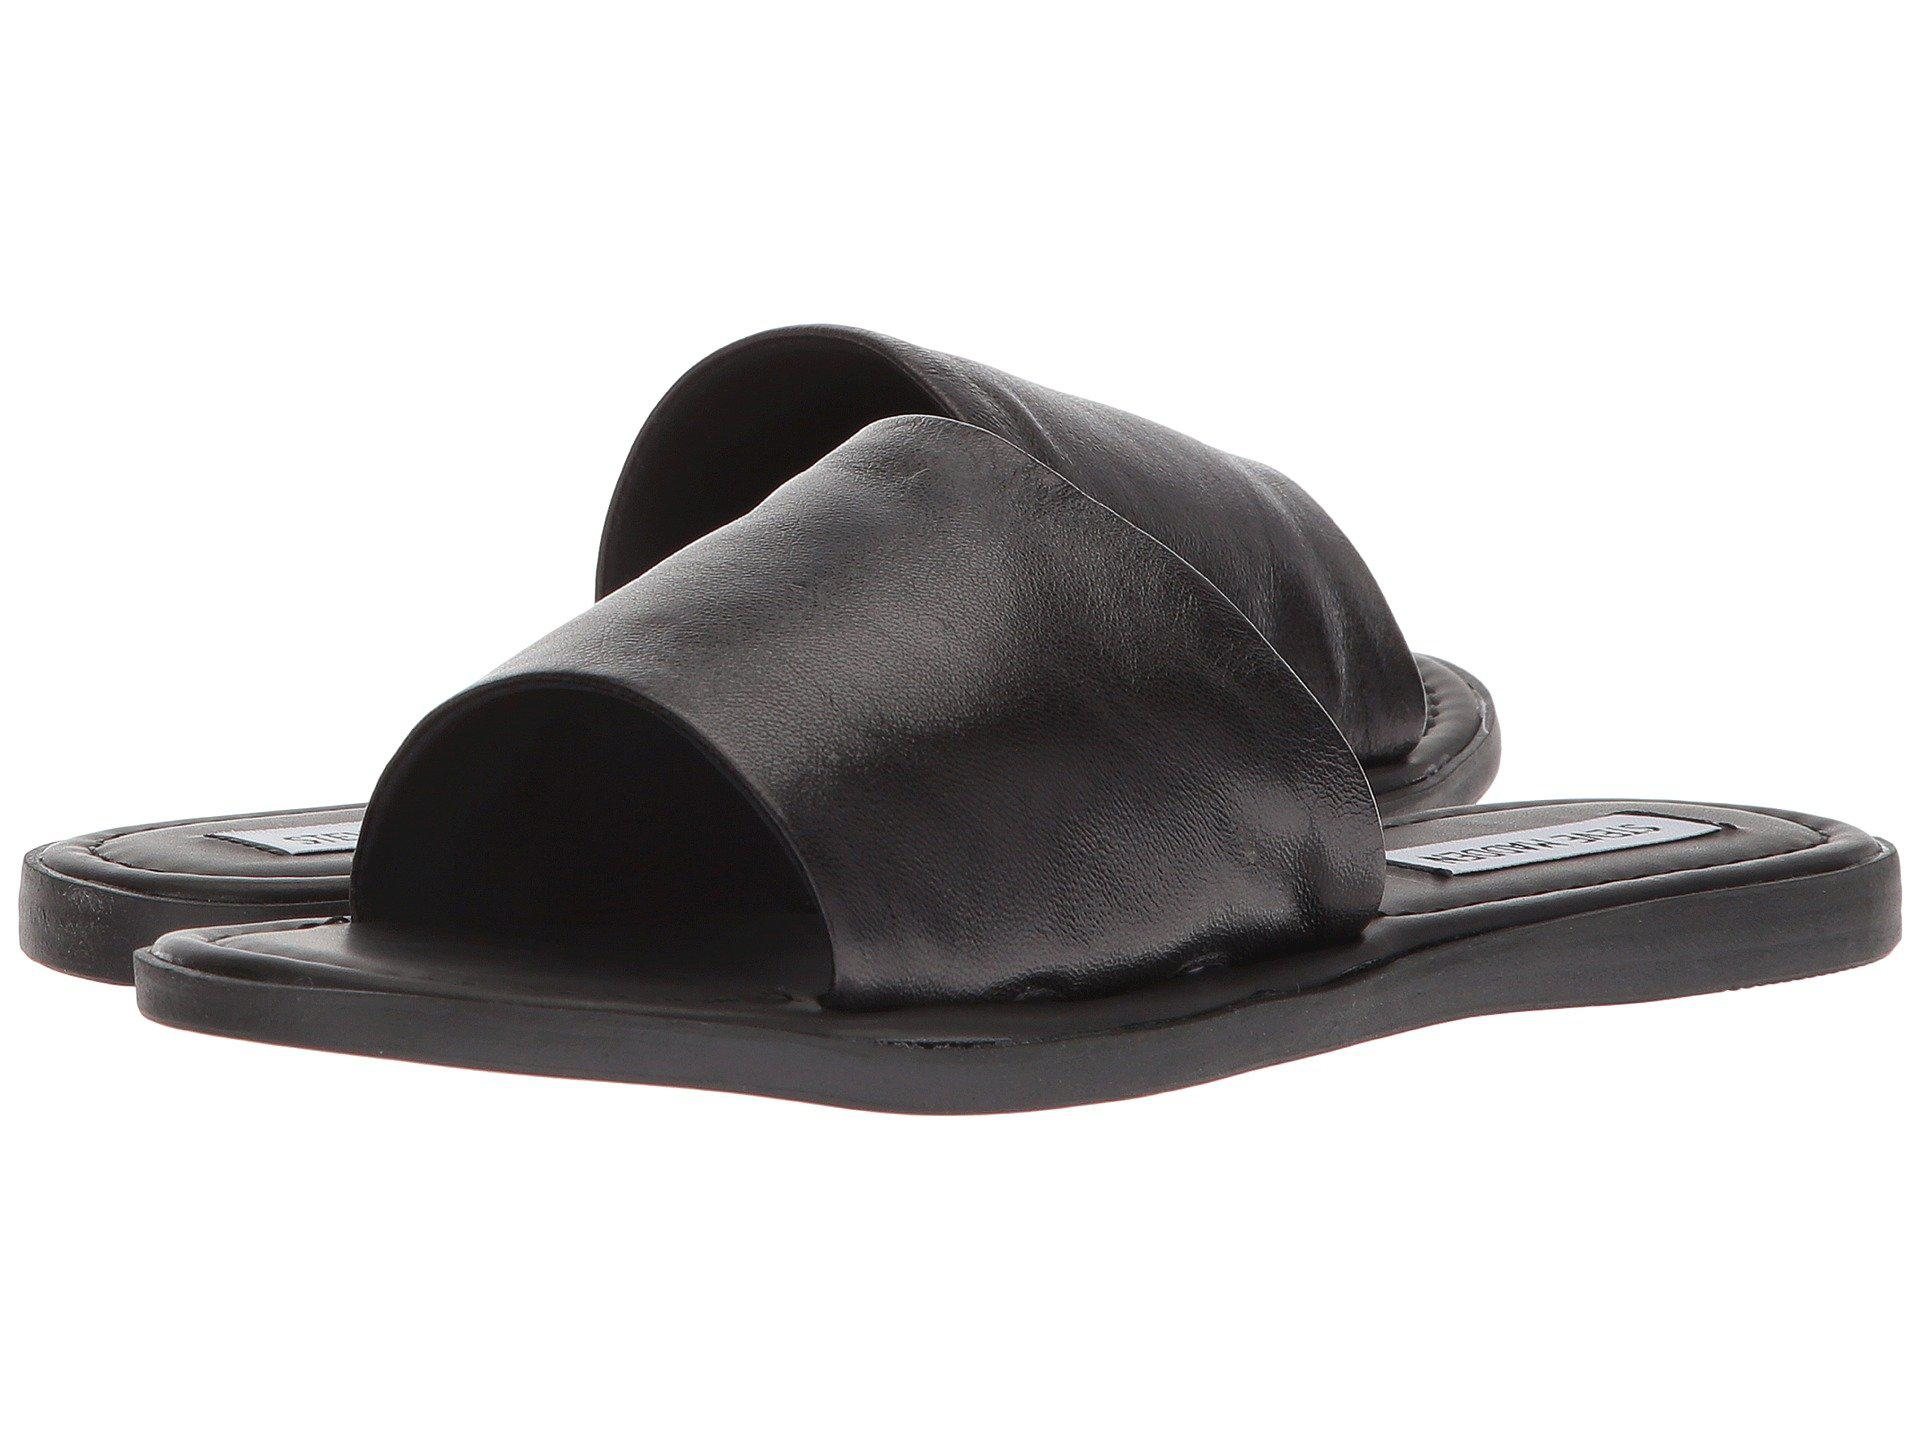 7dd414c96aa8 Lyst - Steve Madden Camilla Flat Sandal in Black